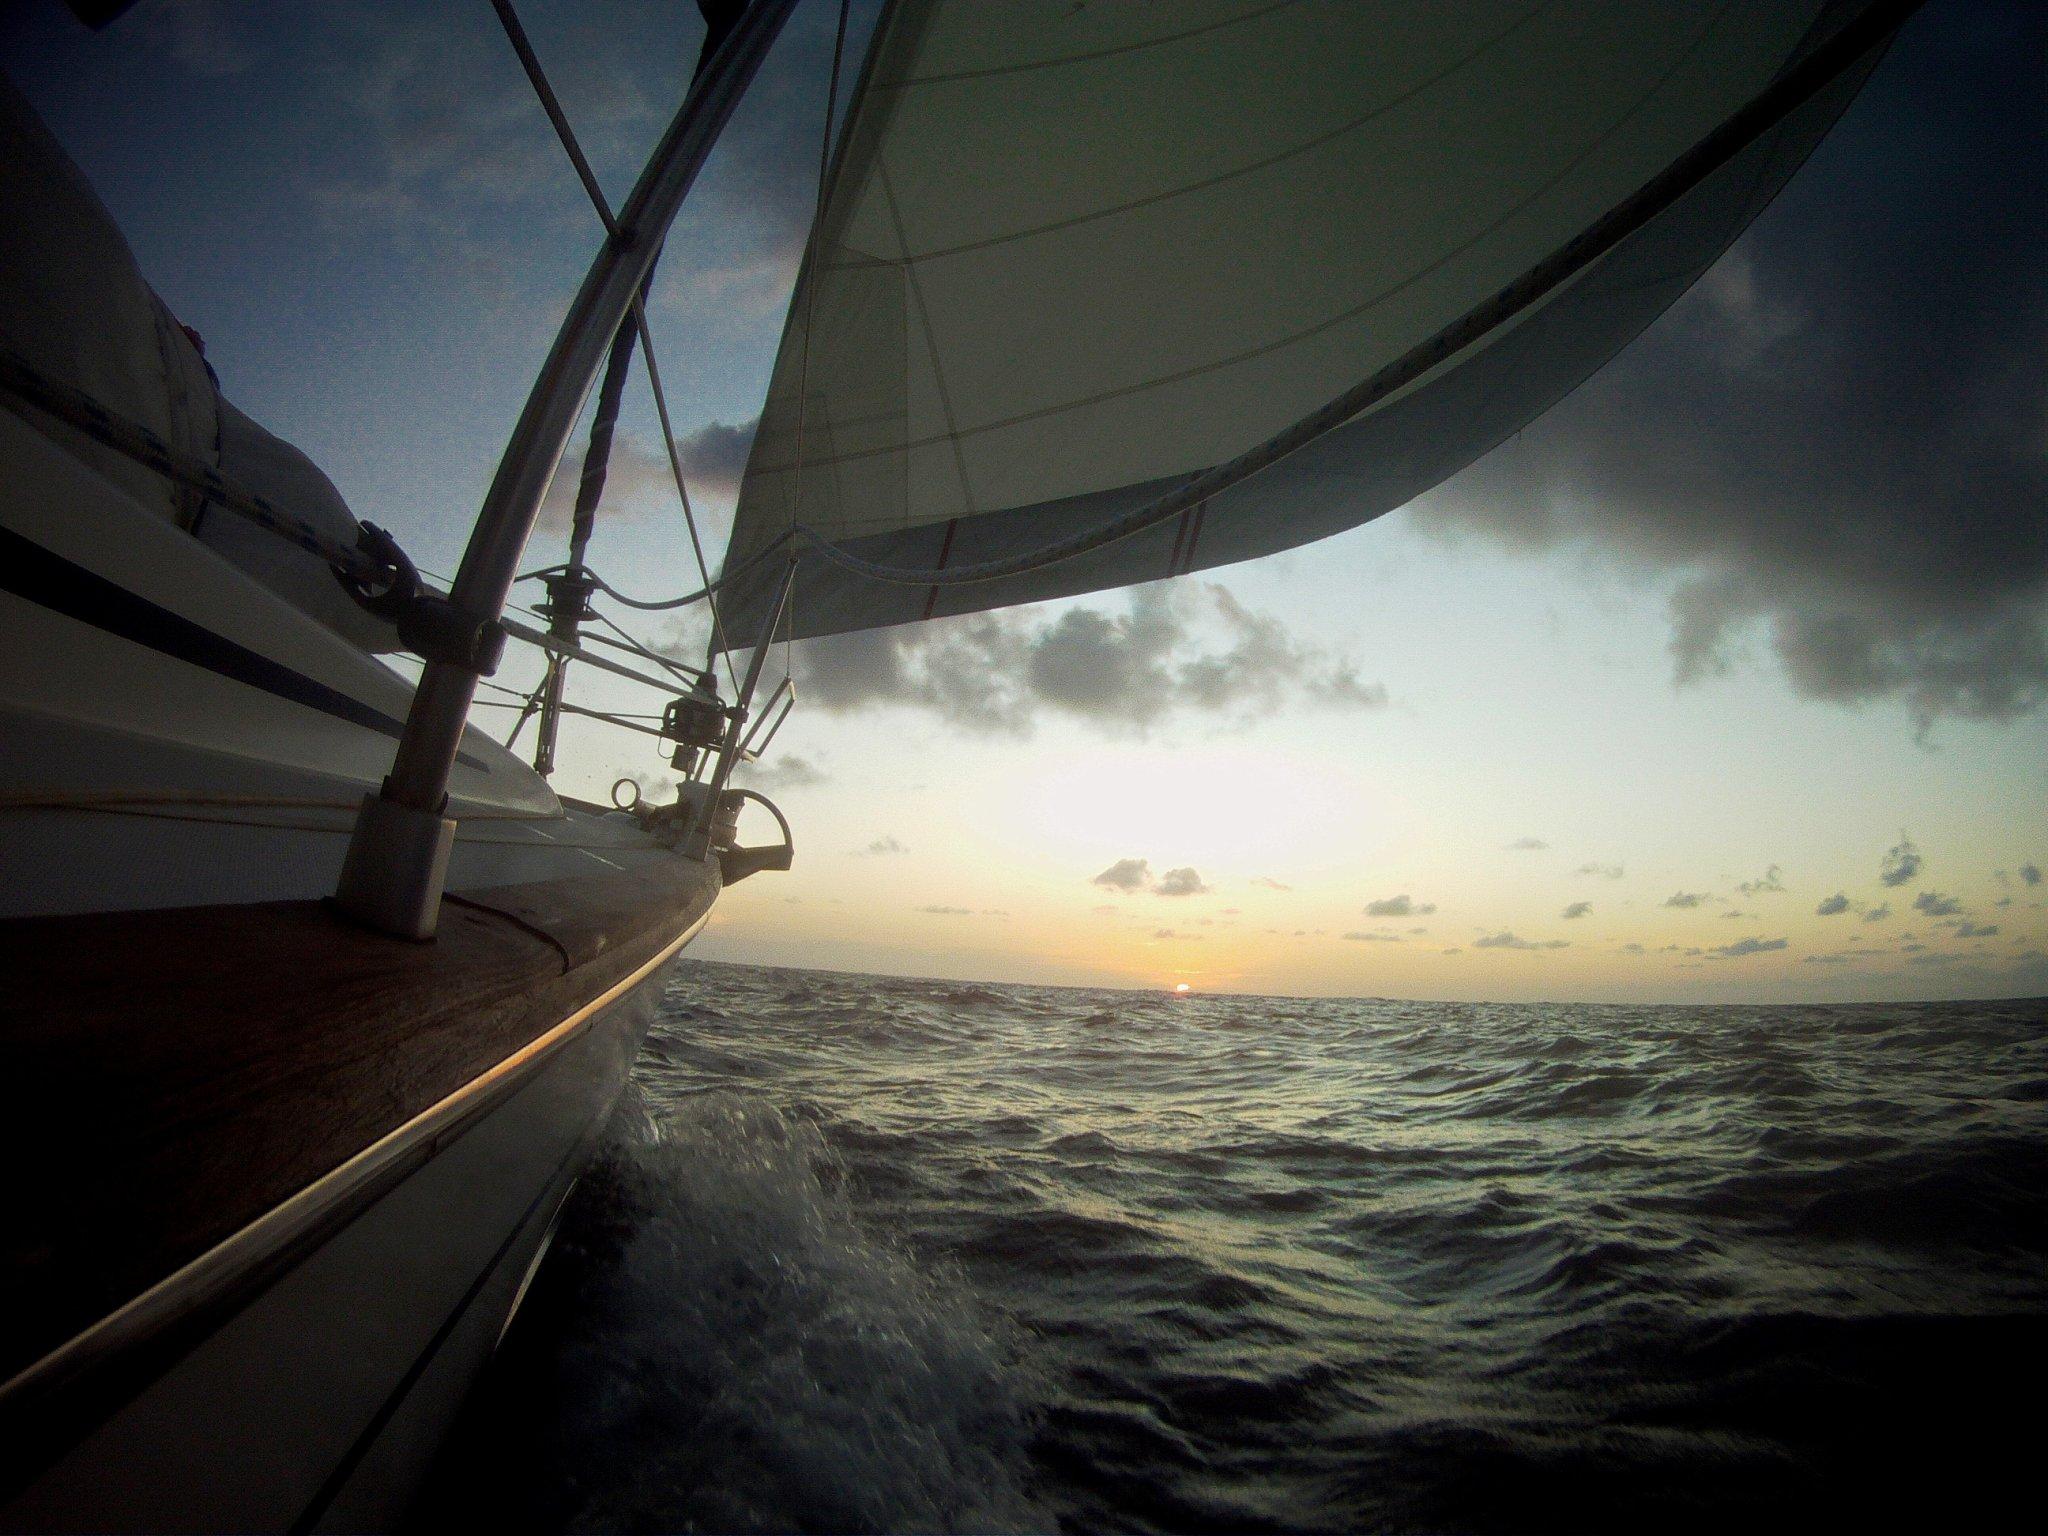 Janneke-Dijkhuis-AdventuresHitch-Sailing-Indian-Ocean